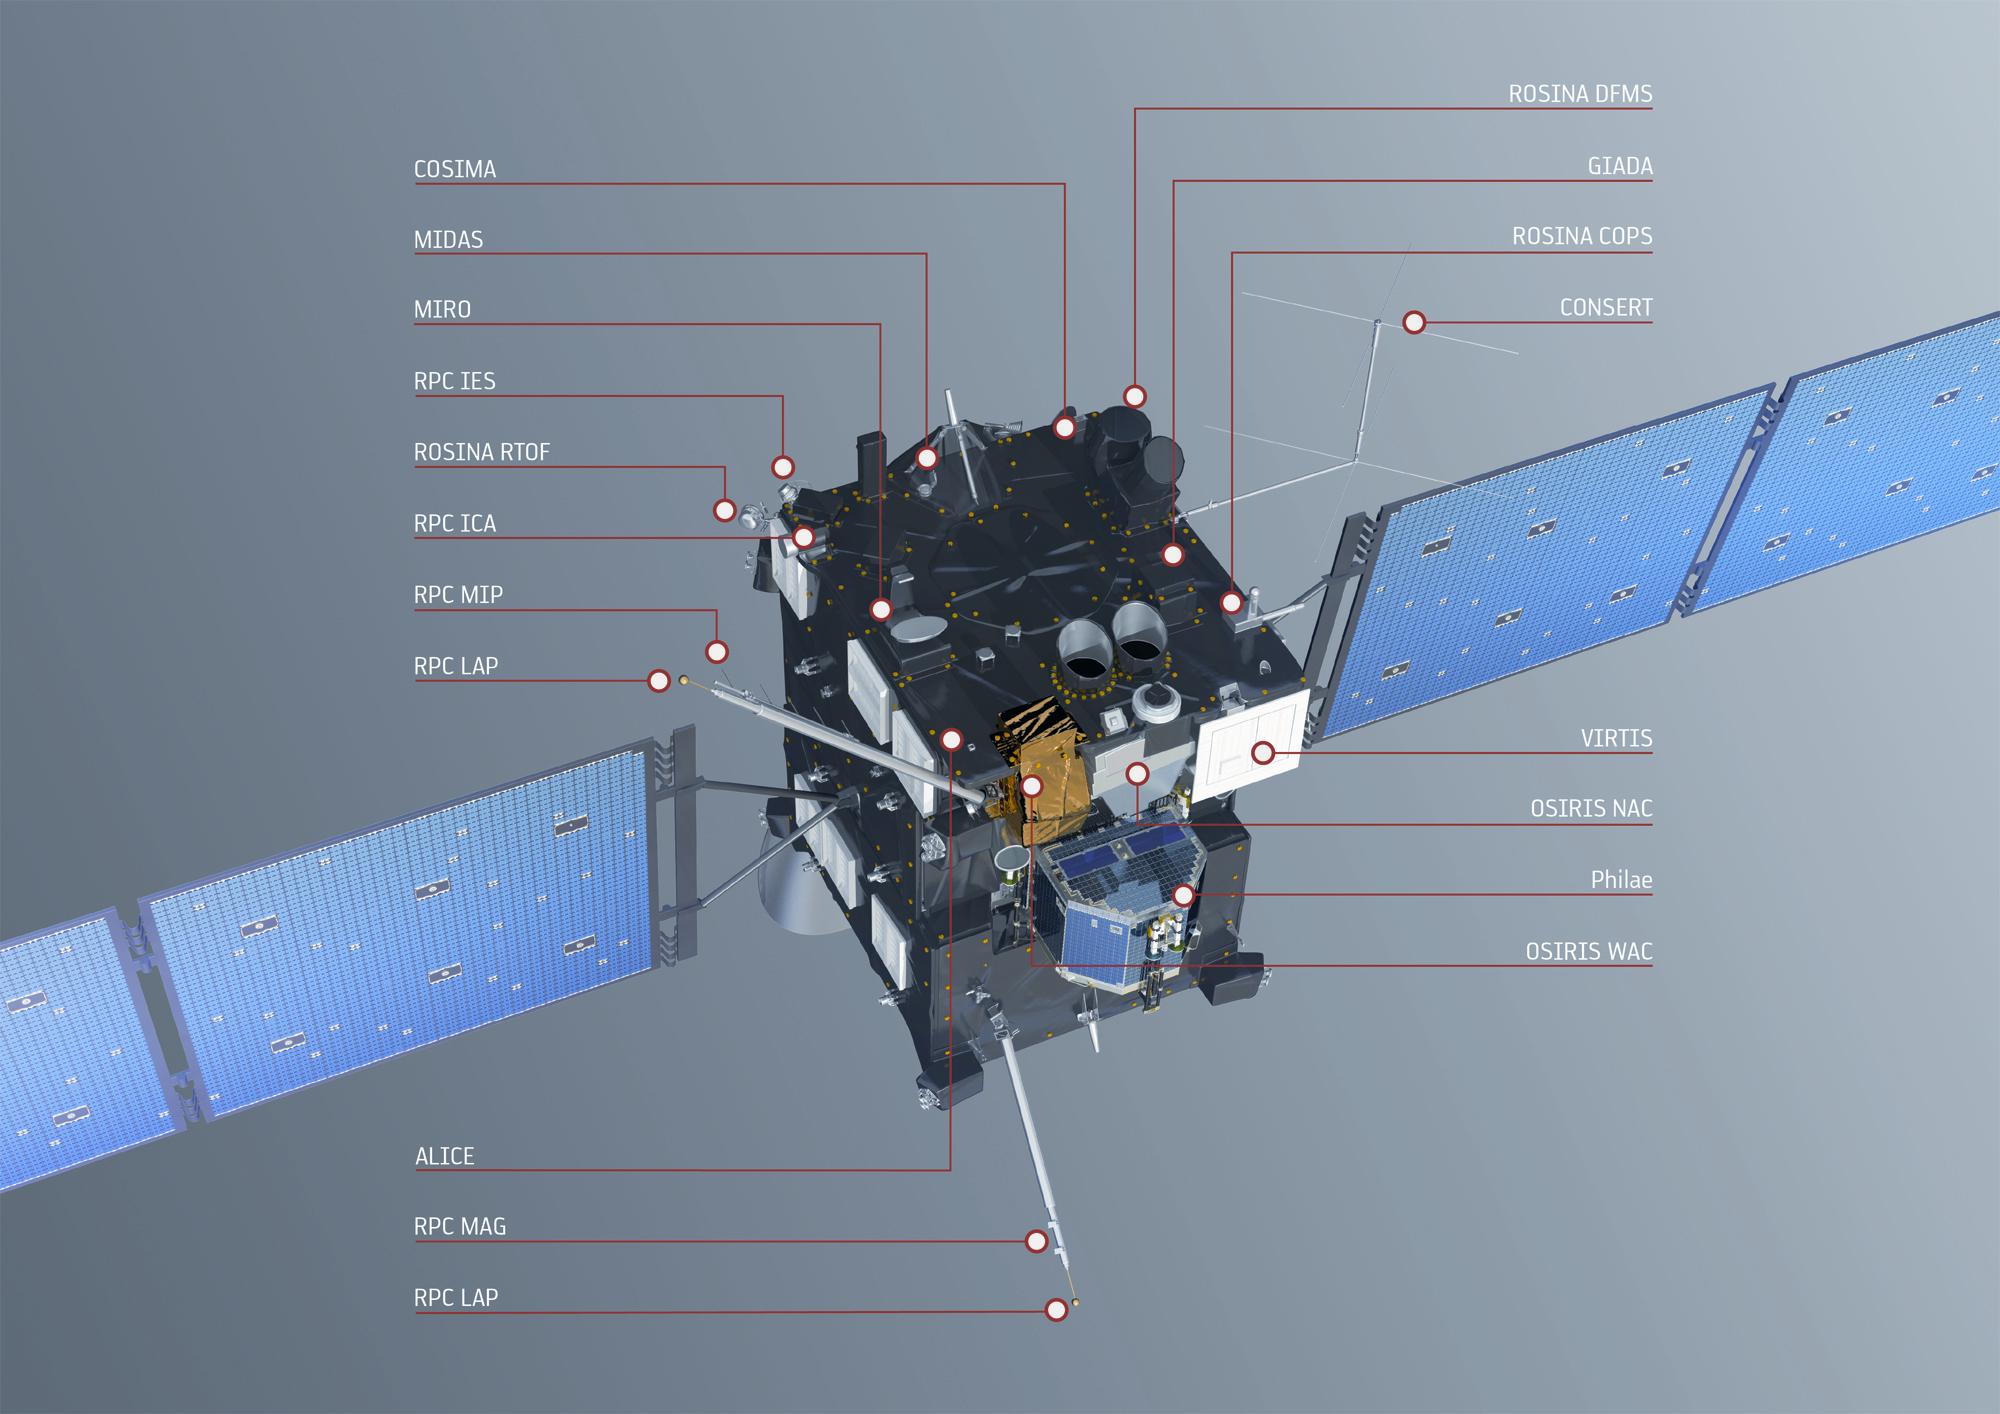 1567216480424-Rosetta_instruments_grey_background_2K.jpg